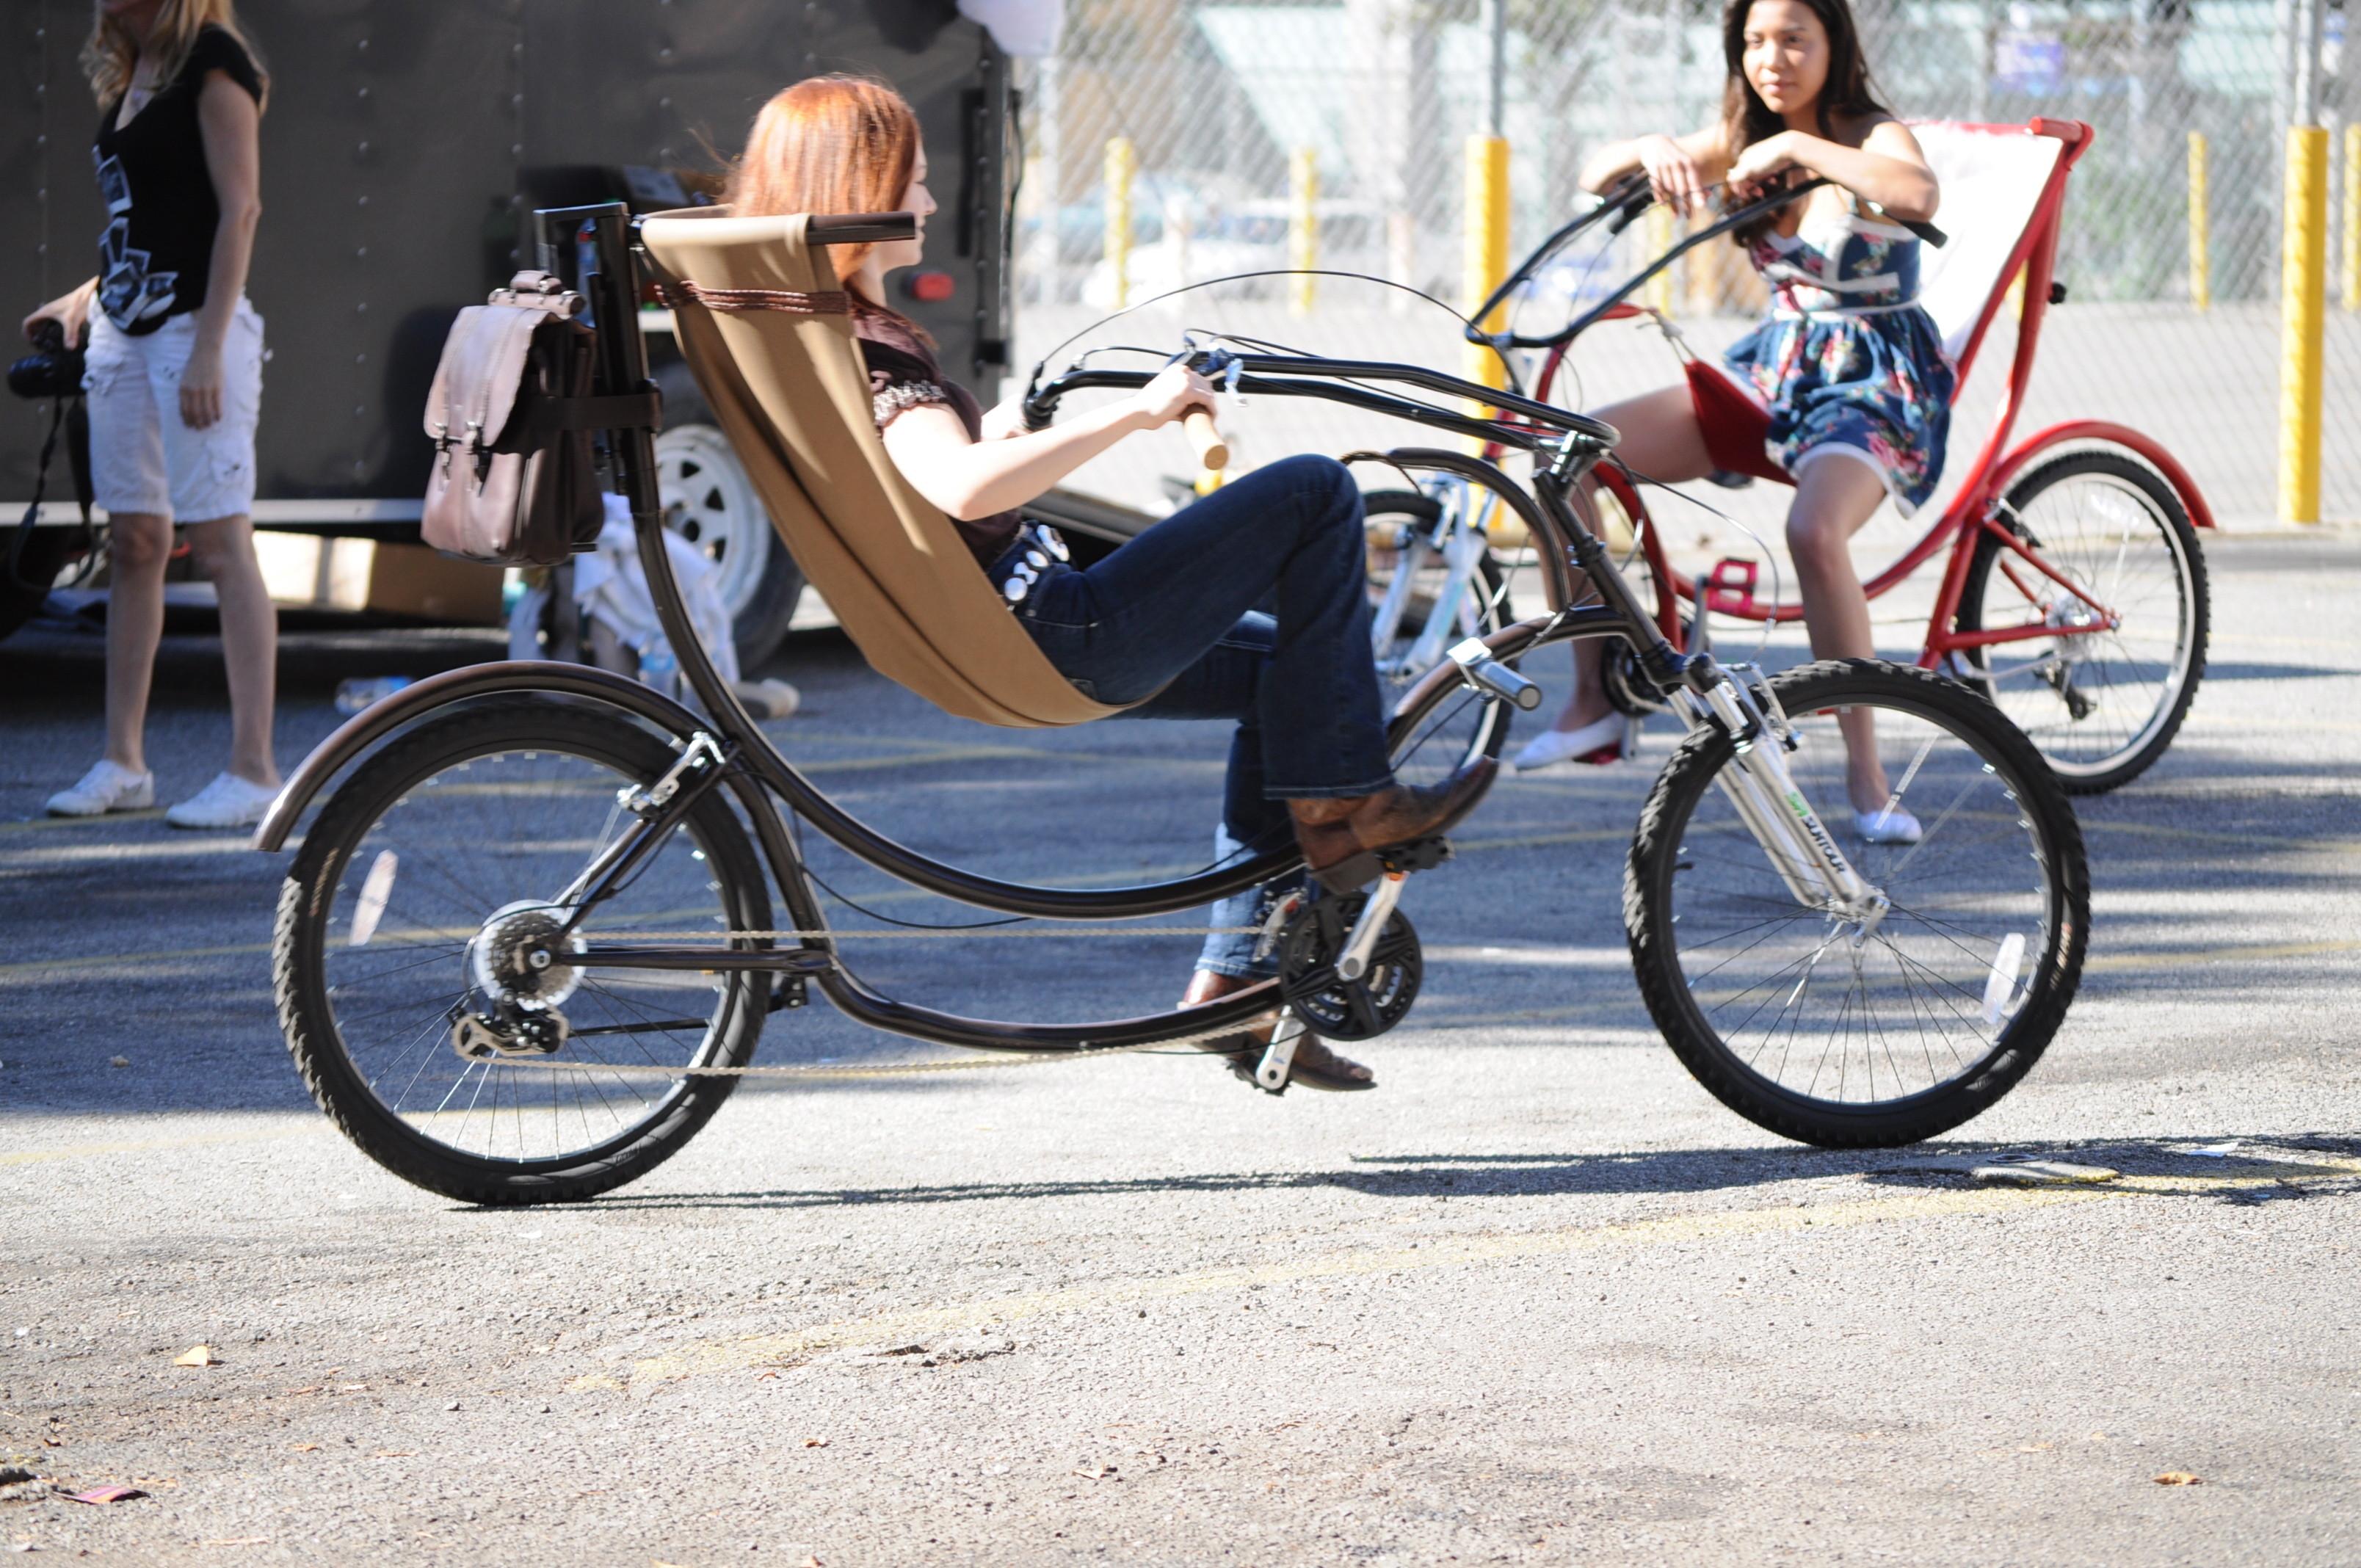 Секс на седле велосипеда 13 фотография